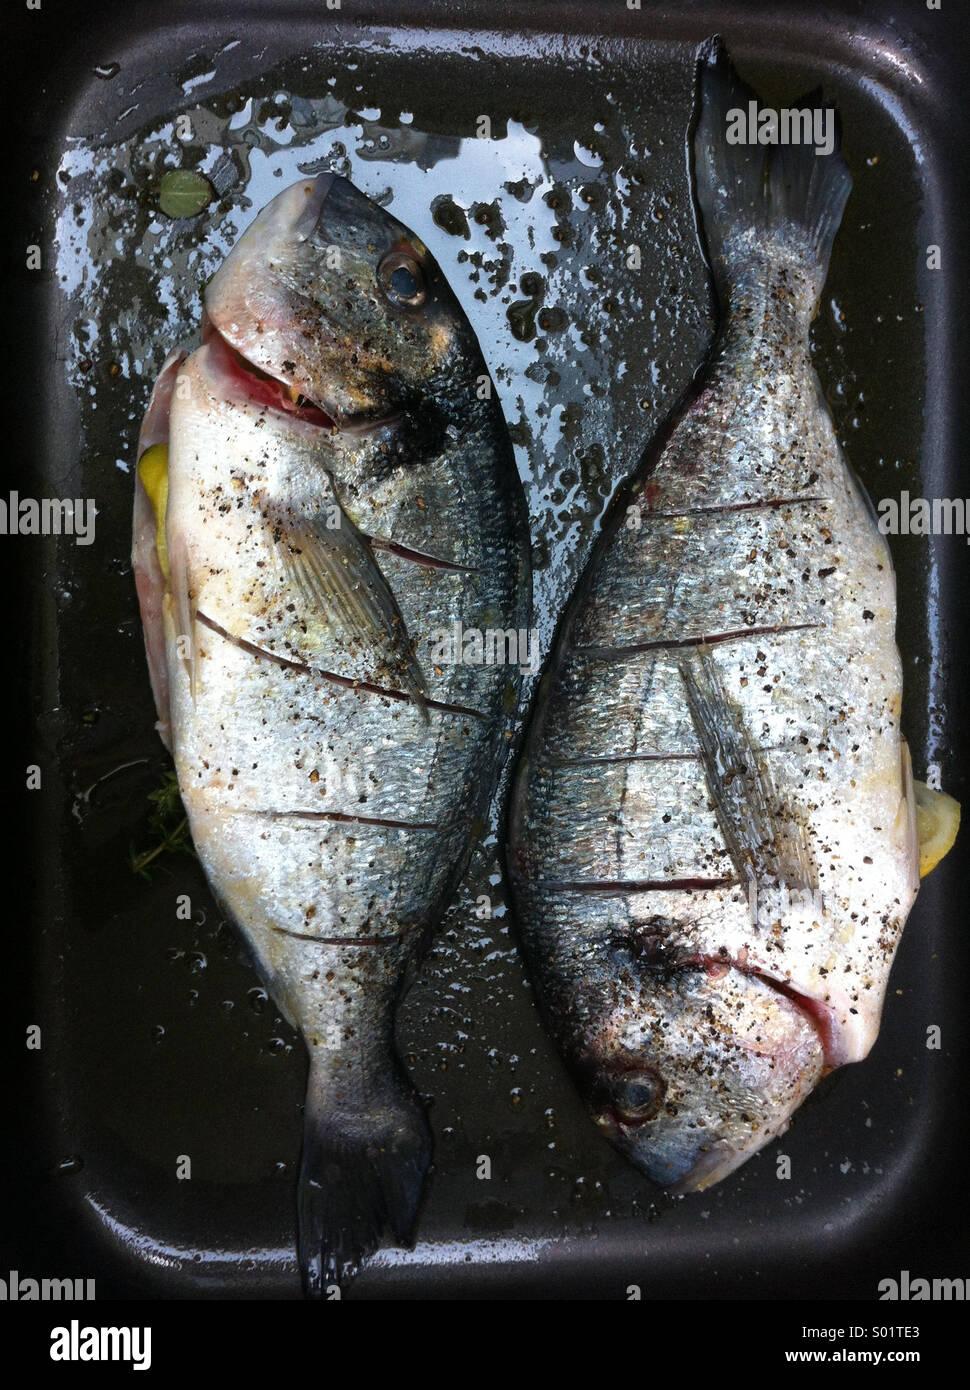 Fisch kochen Stockbild